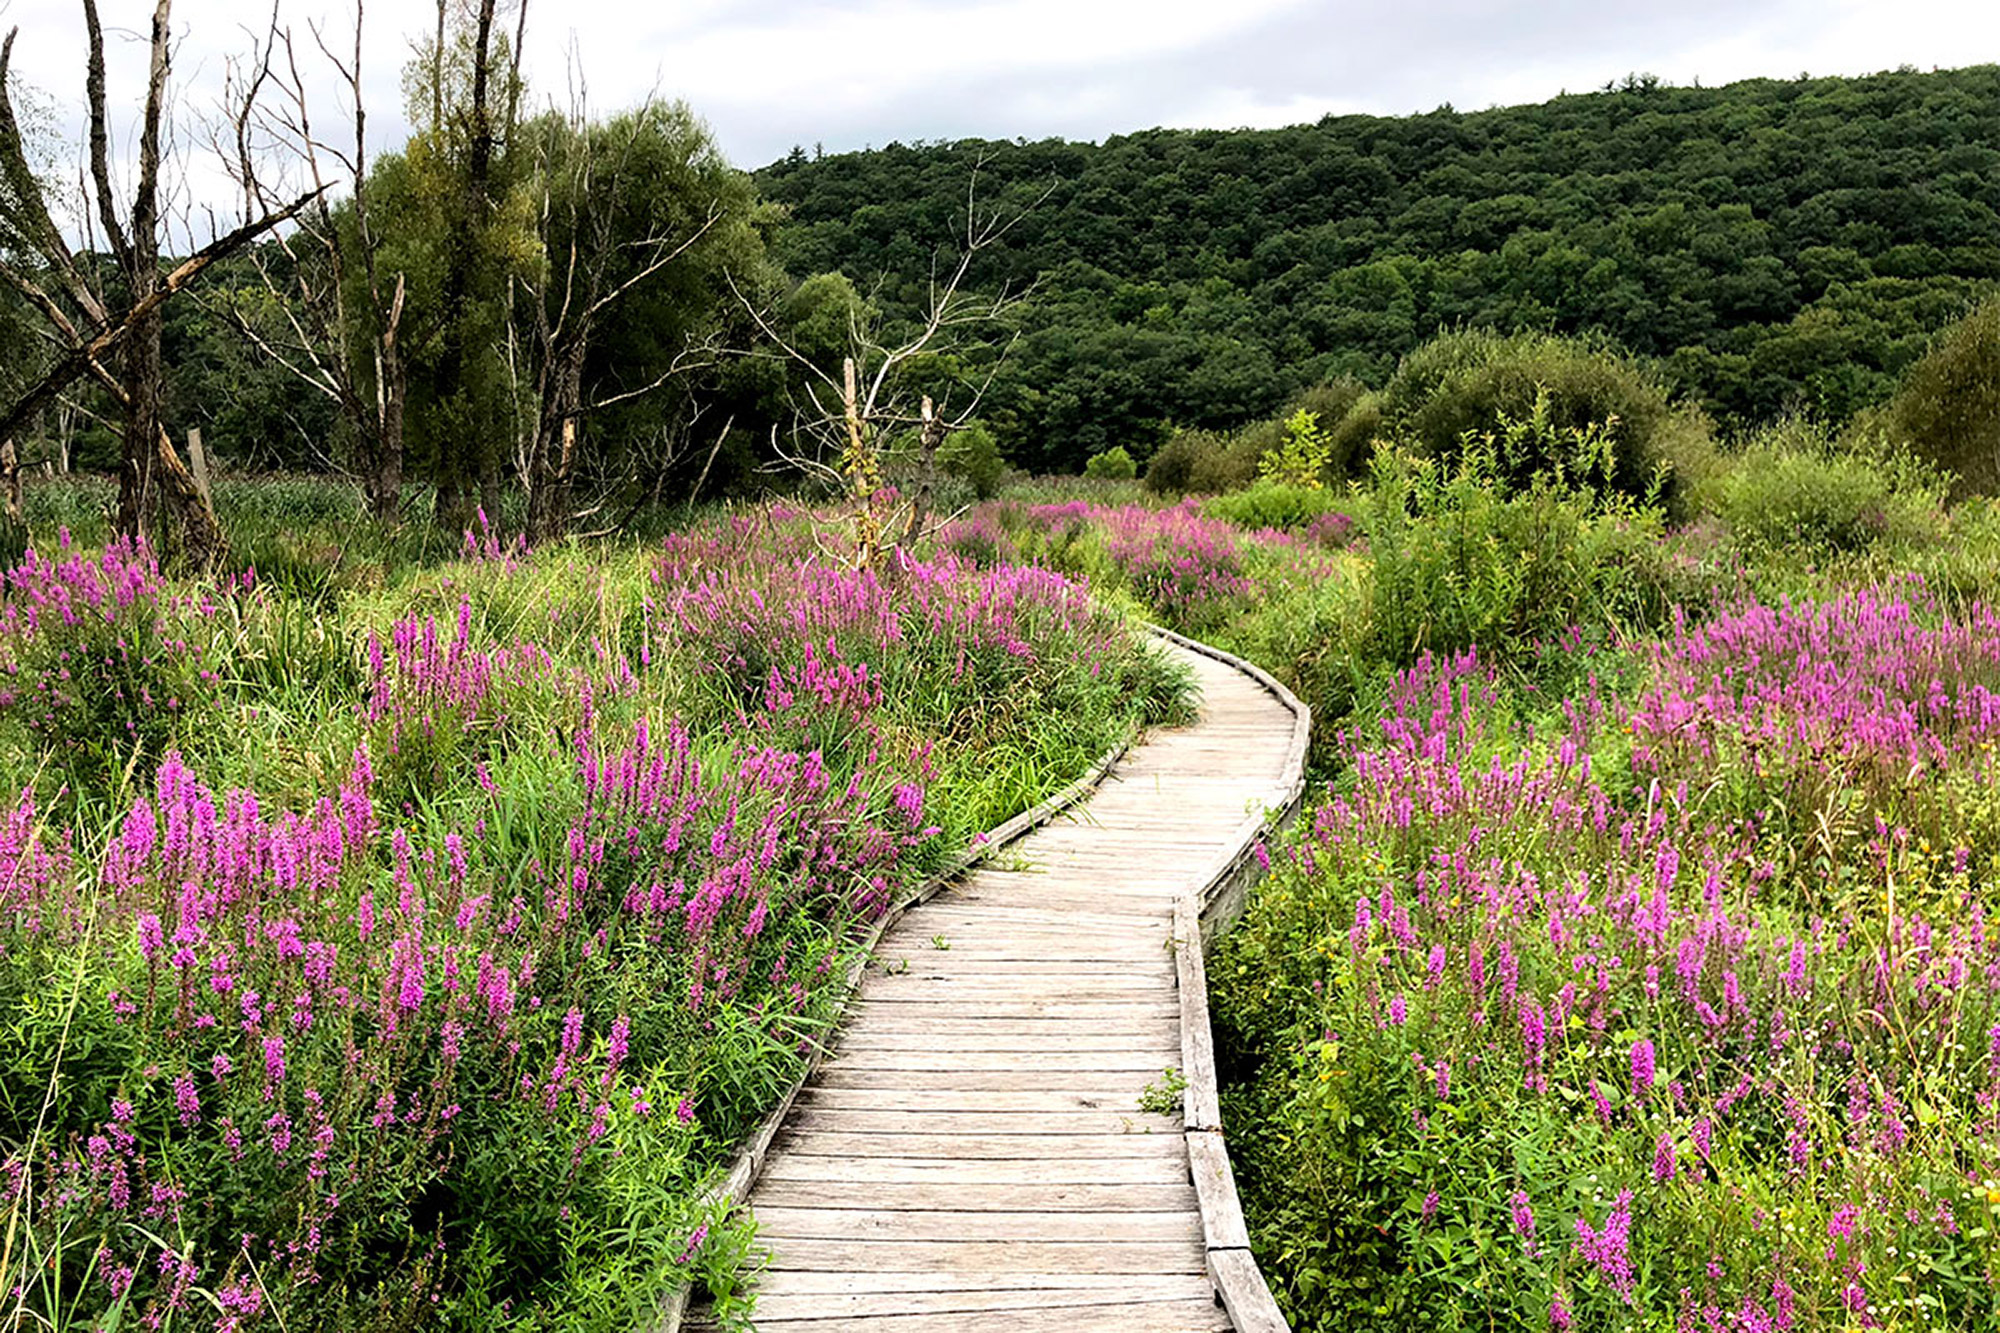 The Swamp River Boardwalk on the Appalachian Trail in Pawling, NY.   Credit: John Lepak